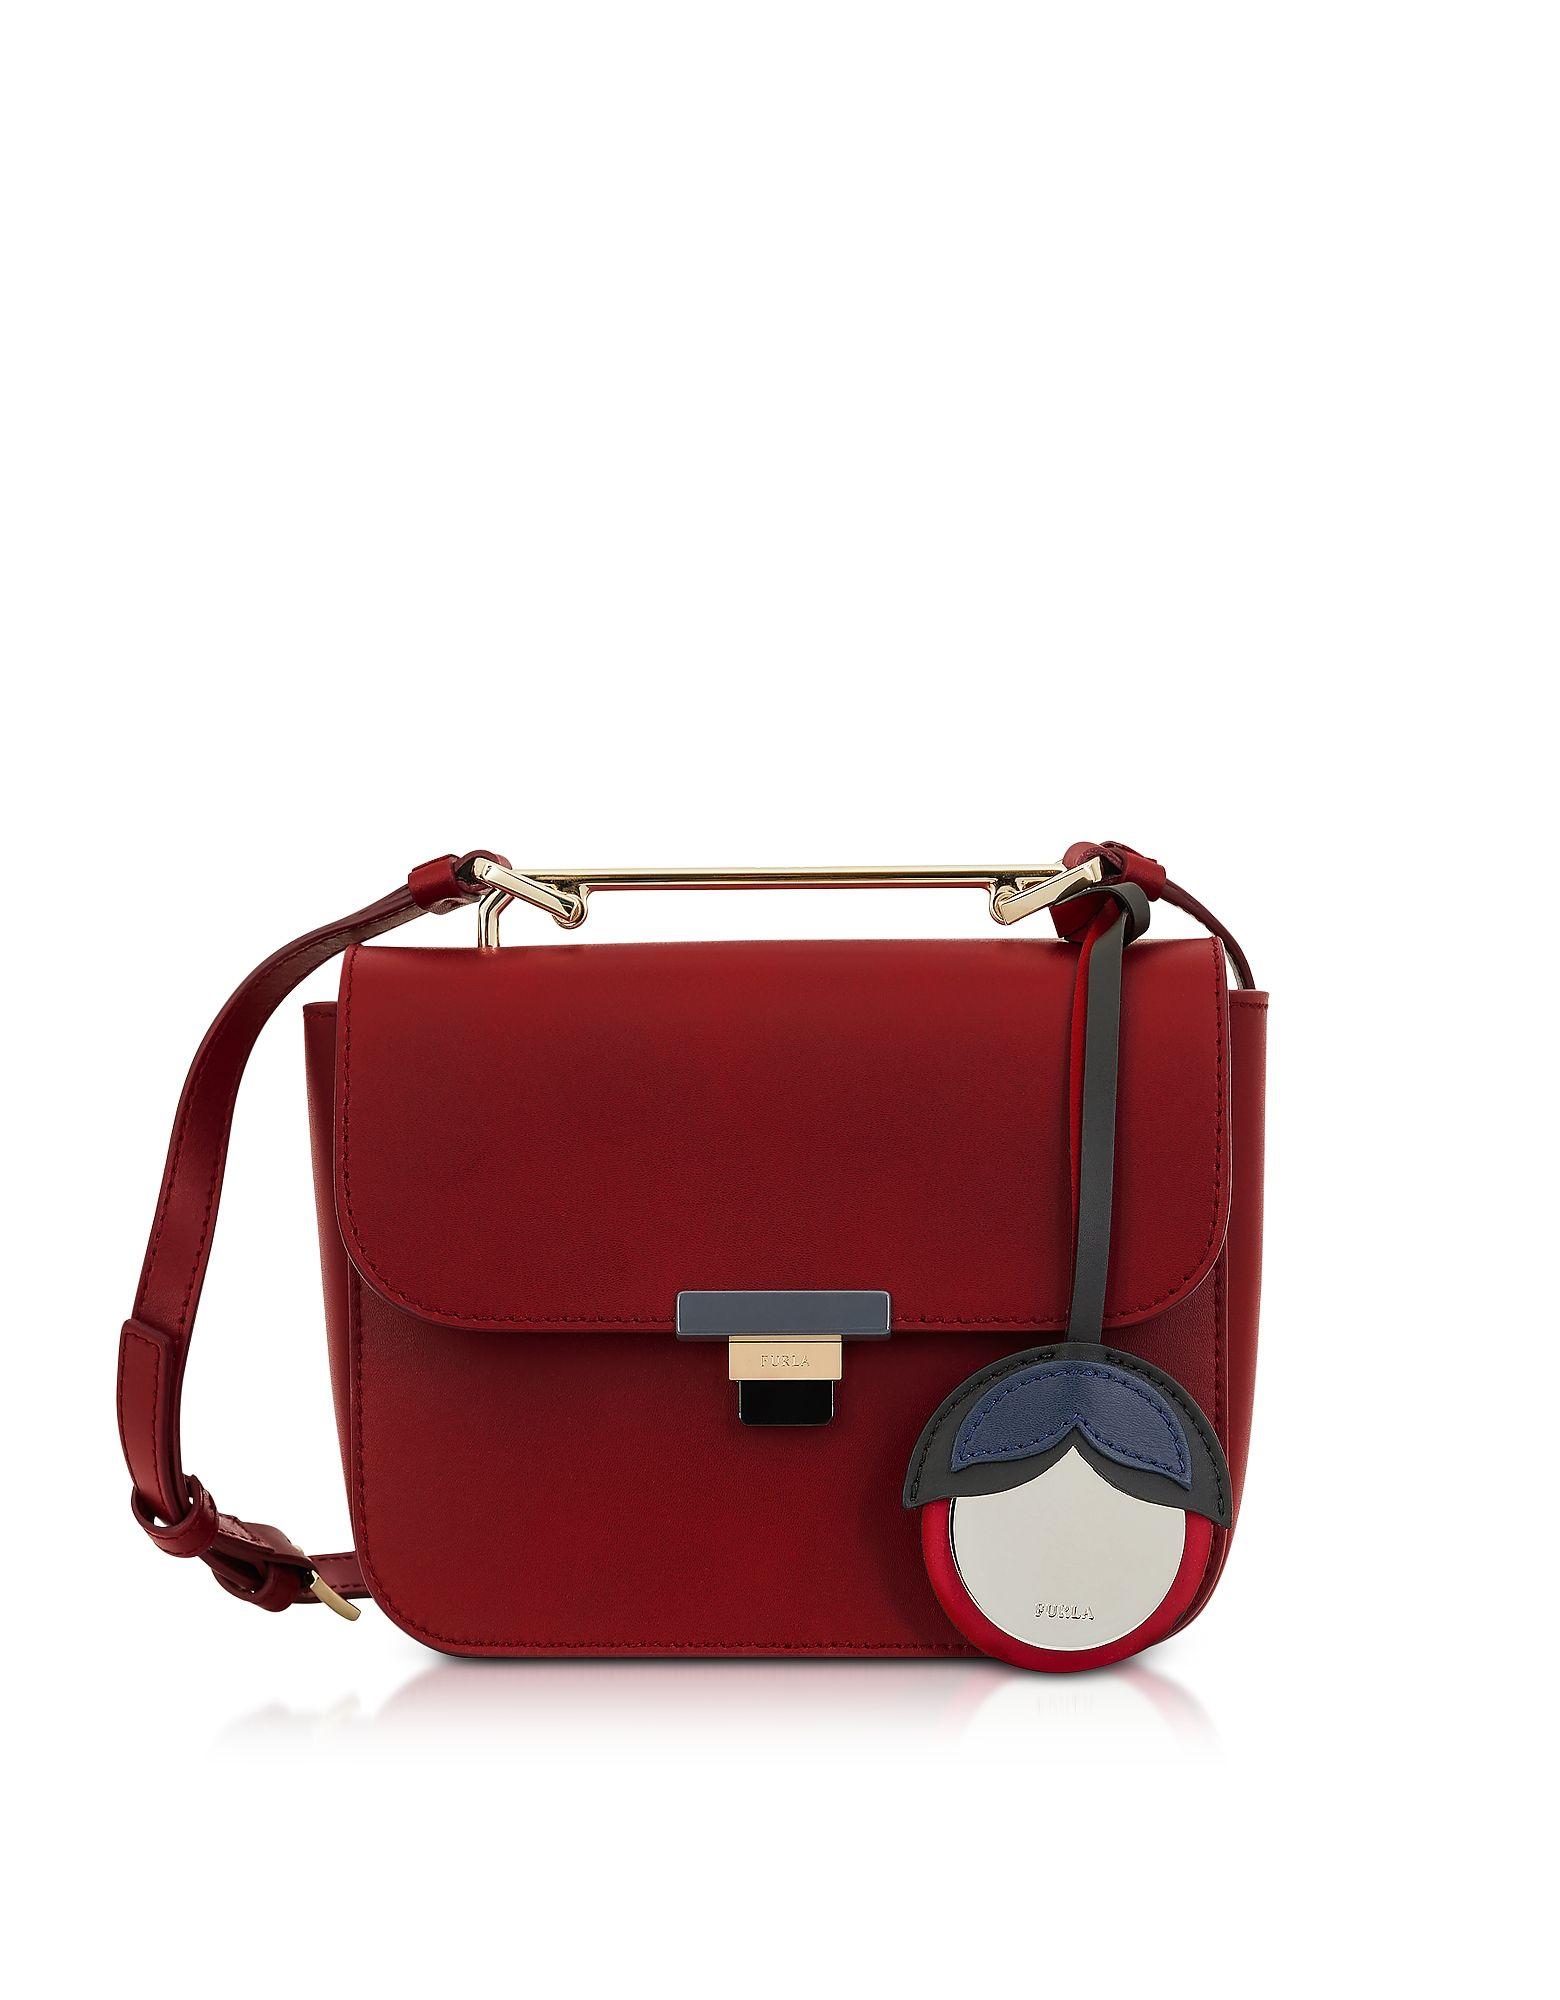 Elisir S Crossbody Bag in Cherry Calfskin Furla sszd1FET